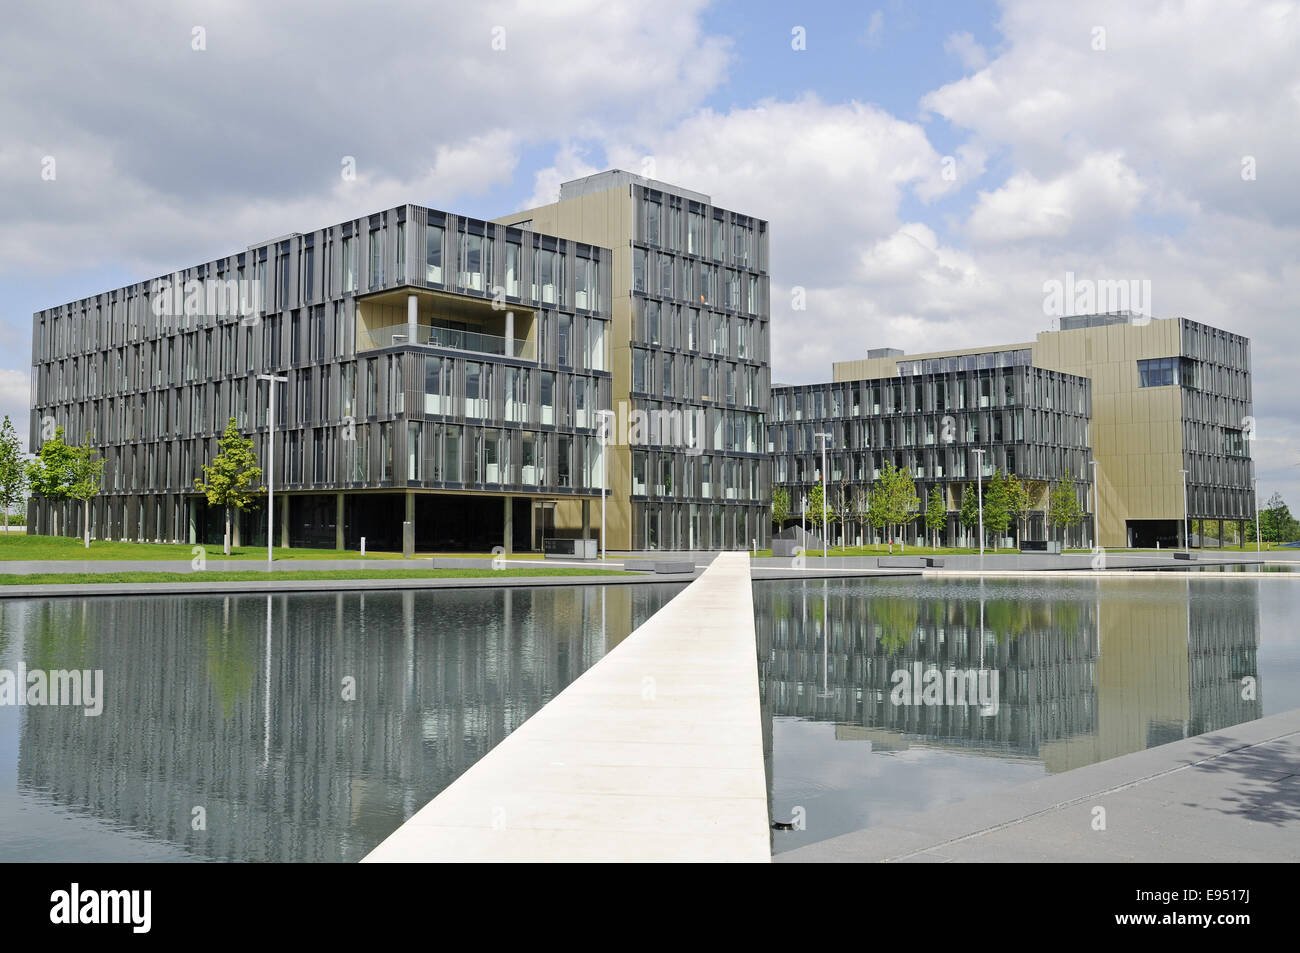 ThyssenKrupp, headquarters, Essen, Germany - Stock Image